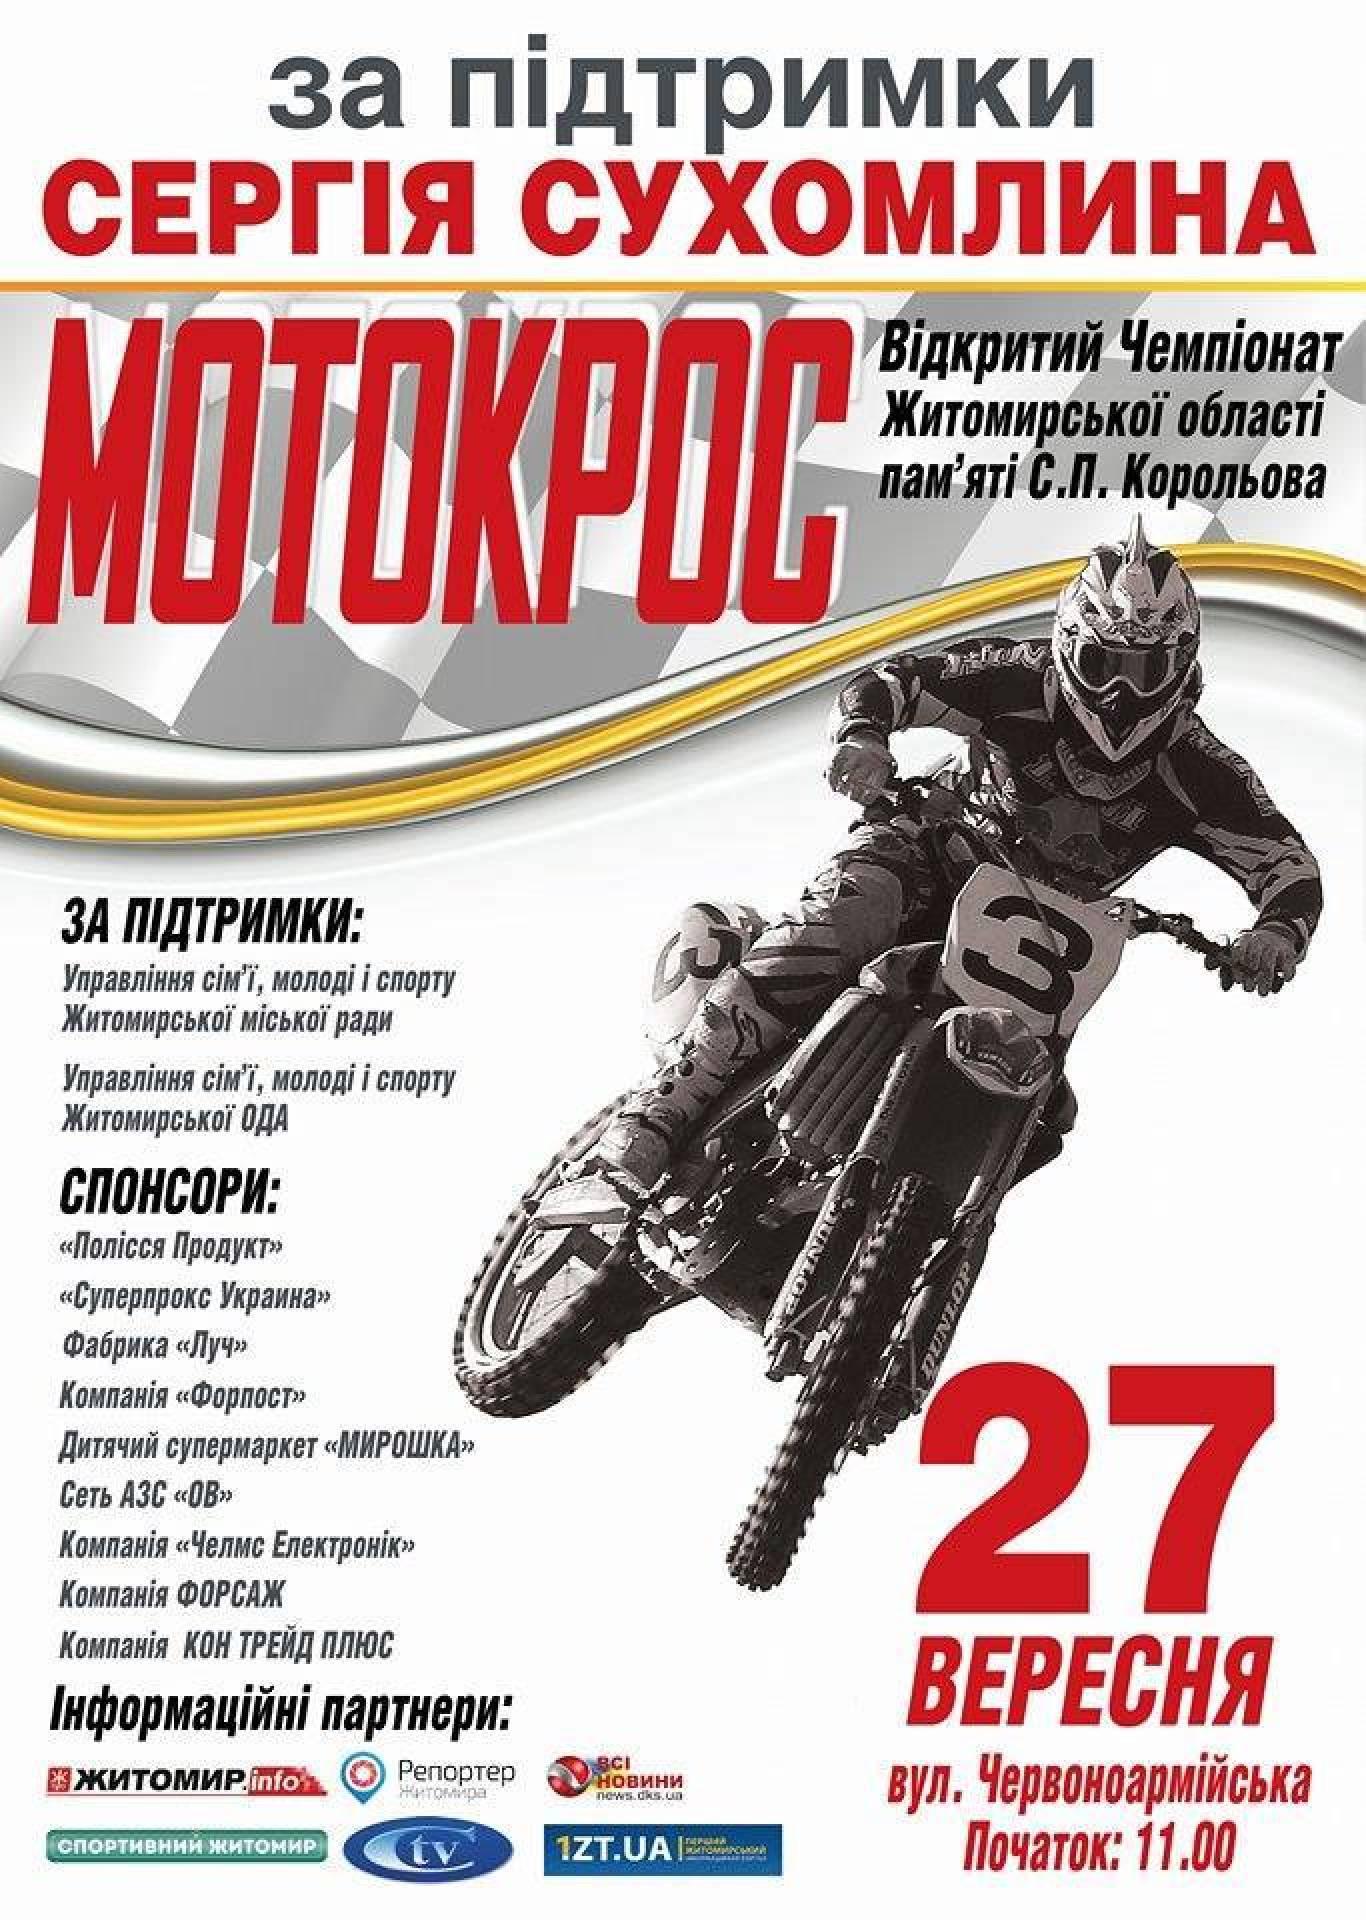 Мотокрос пам'яті С.П. Корольова